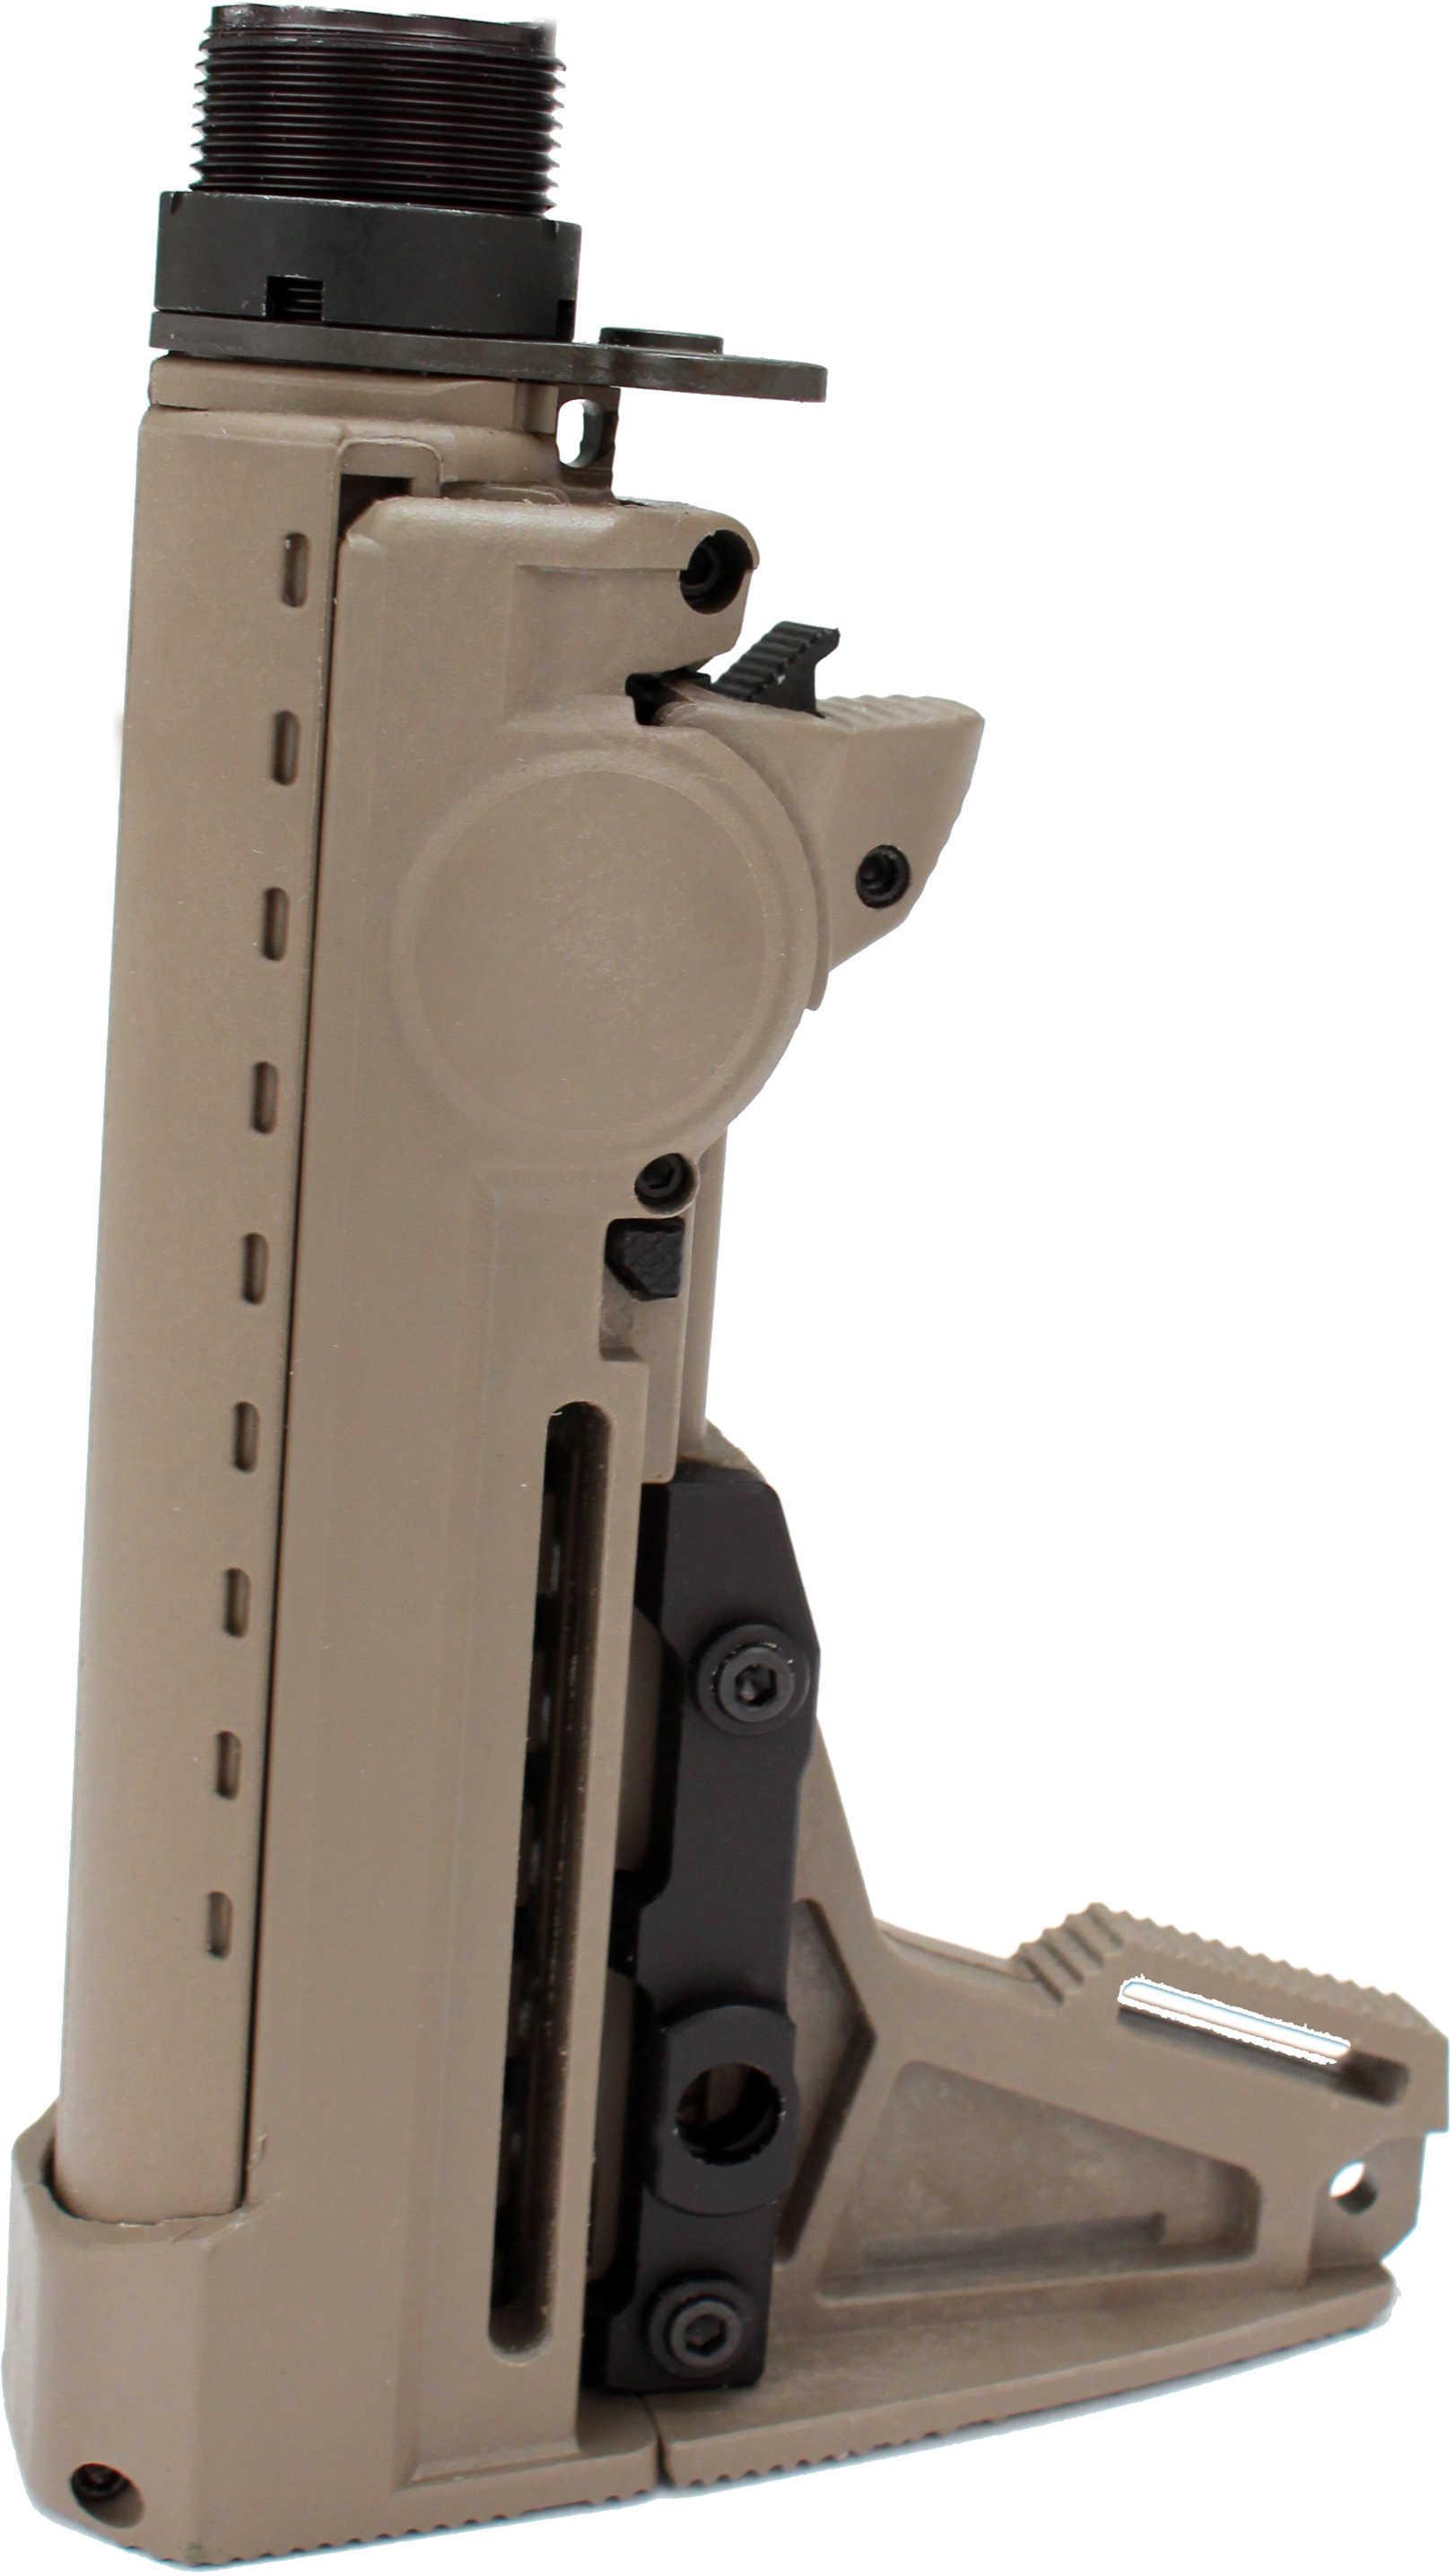 F93-AR-15 /M16 Adjustable ProStock Assembly Flat Dark Earth Md: 4925-De